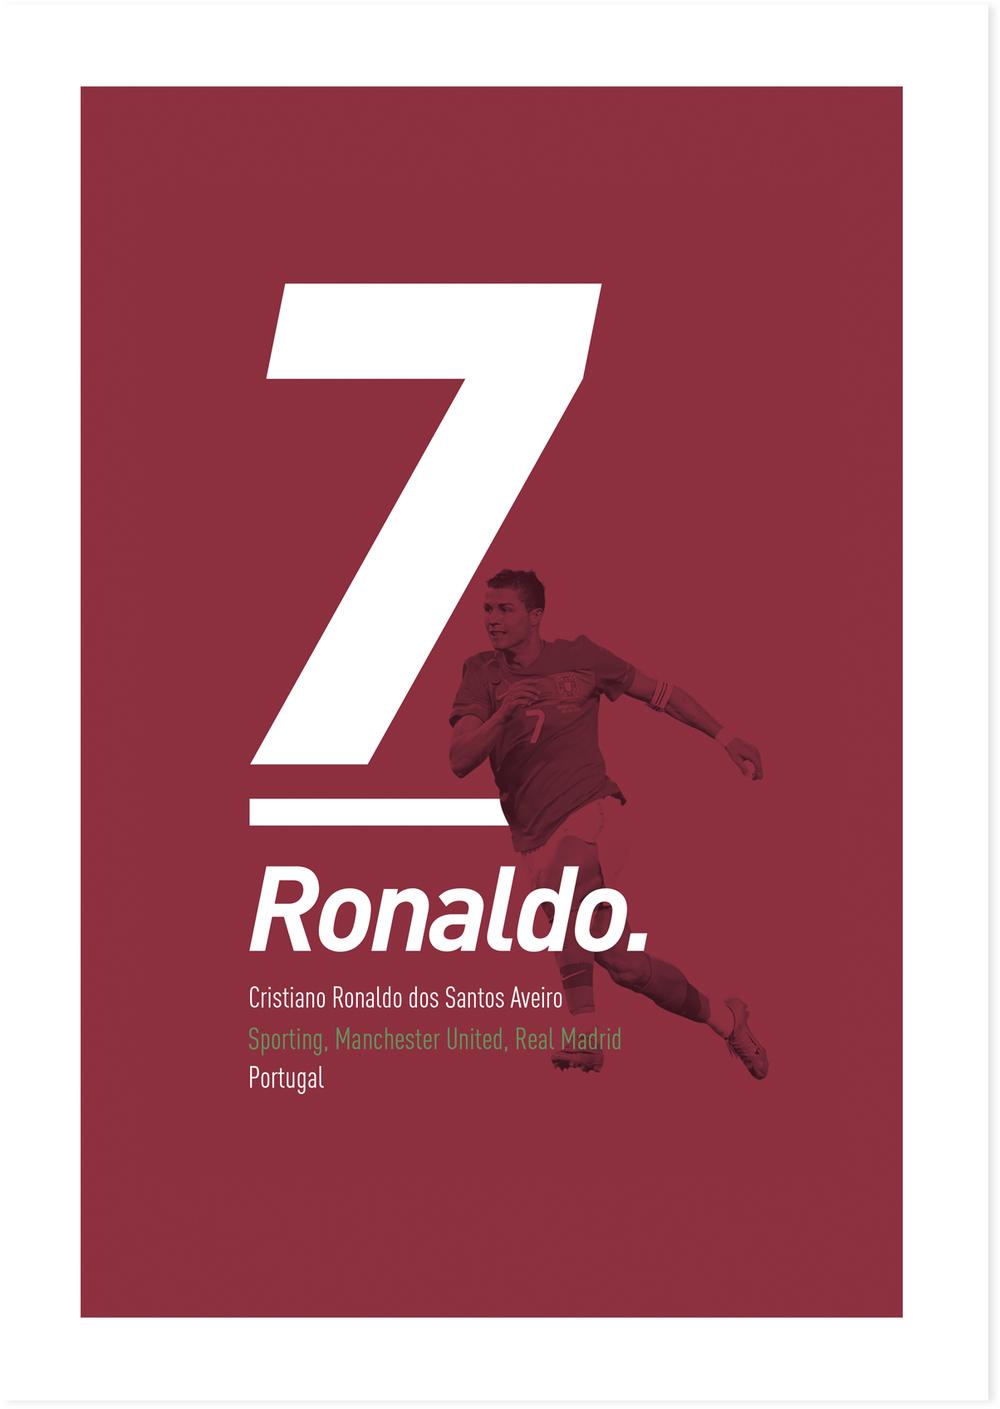 Ronaldo_web.jpg